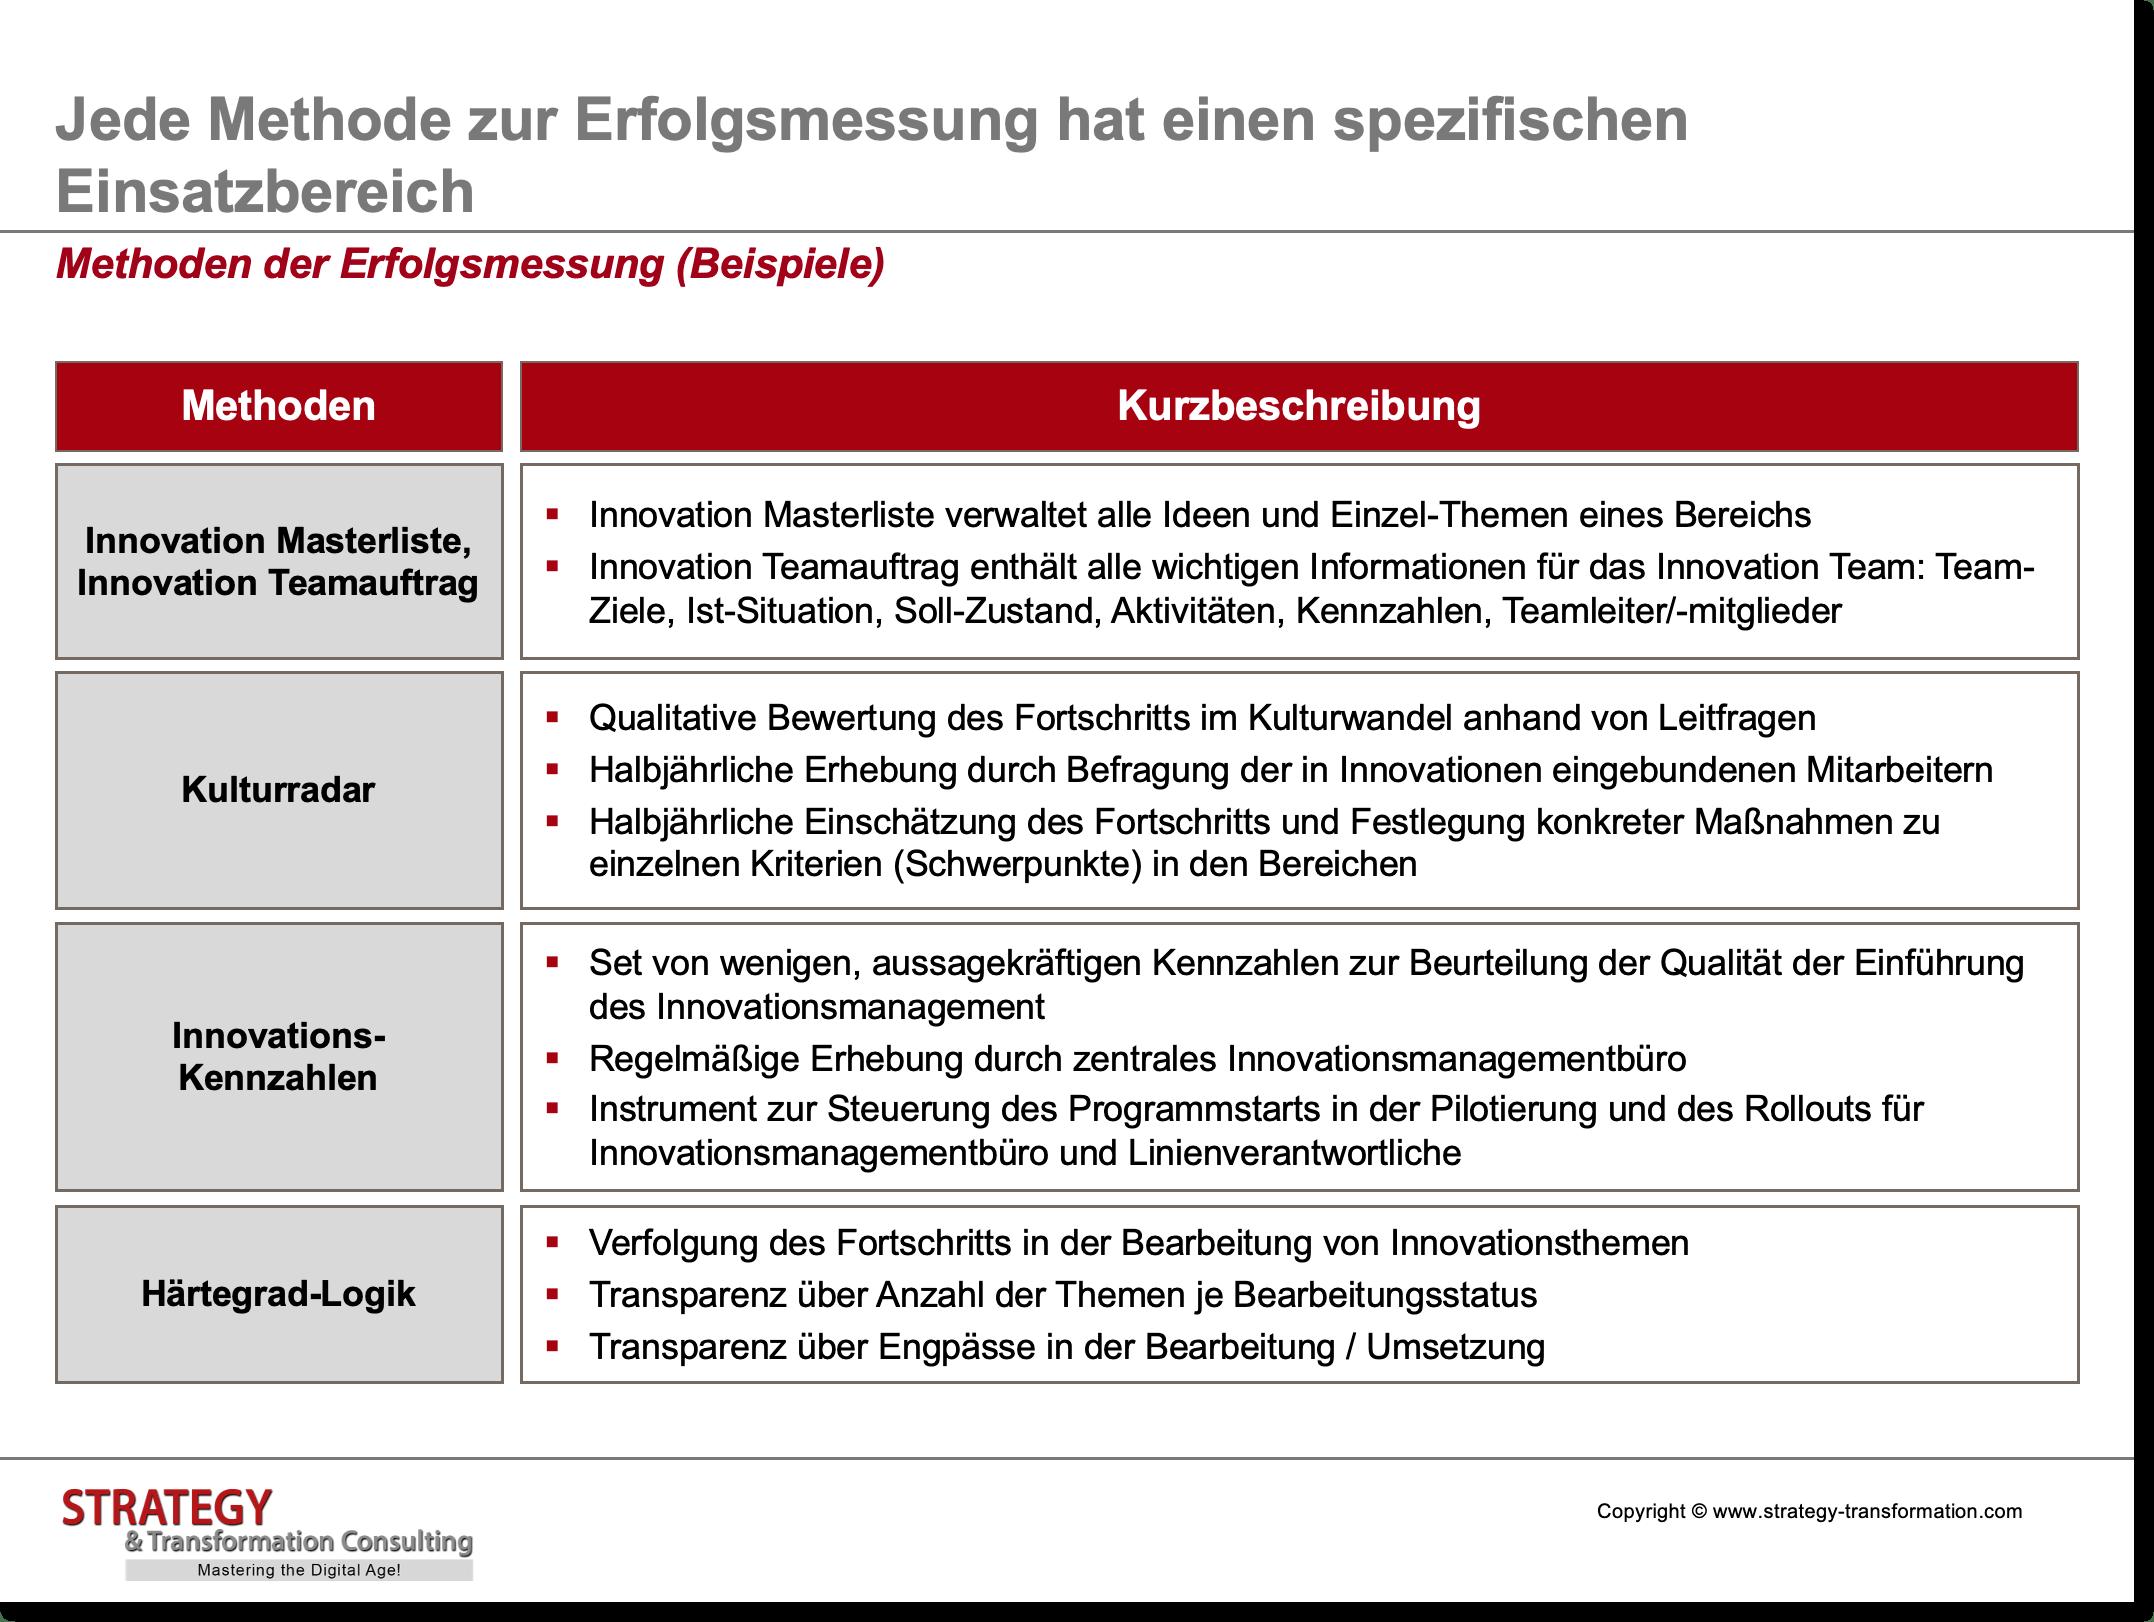 Innovationsmanagement_Methoden der Erfolgsmessung